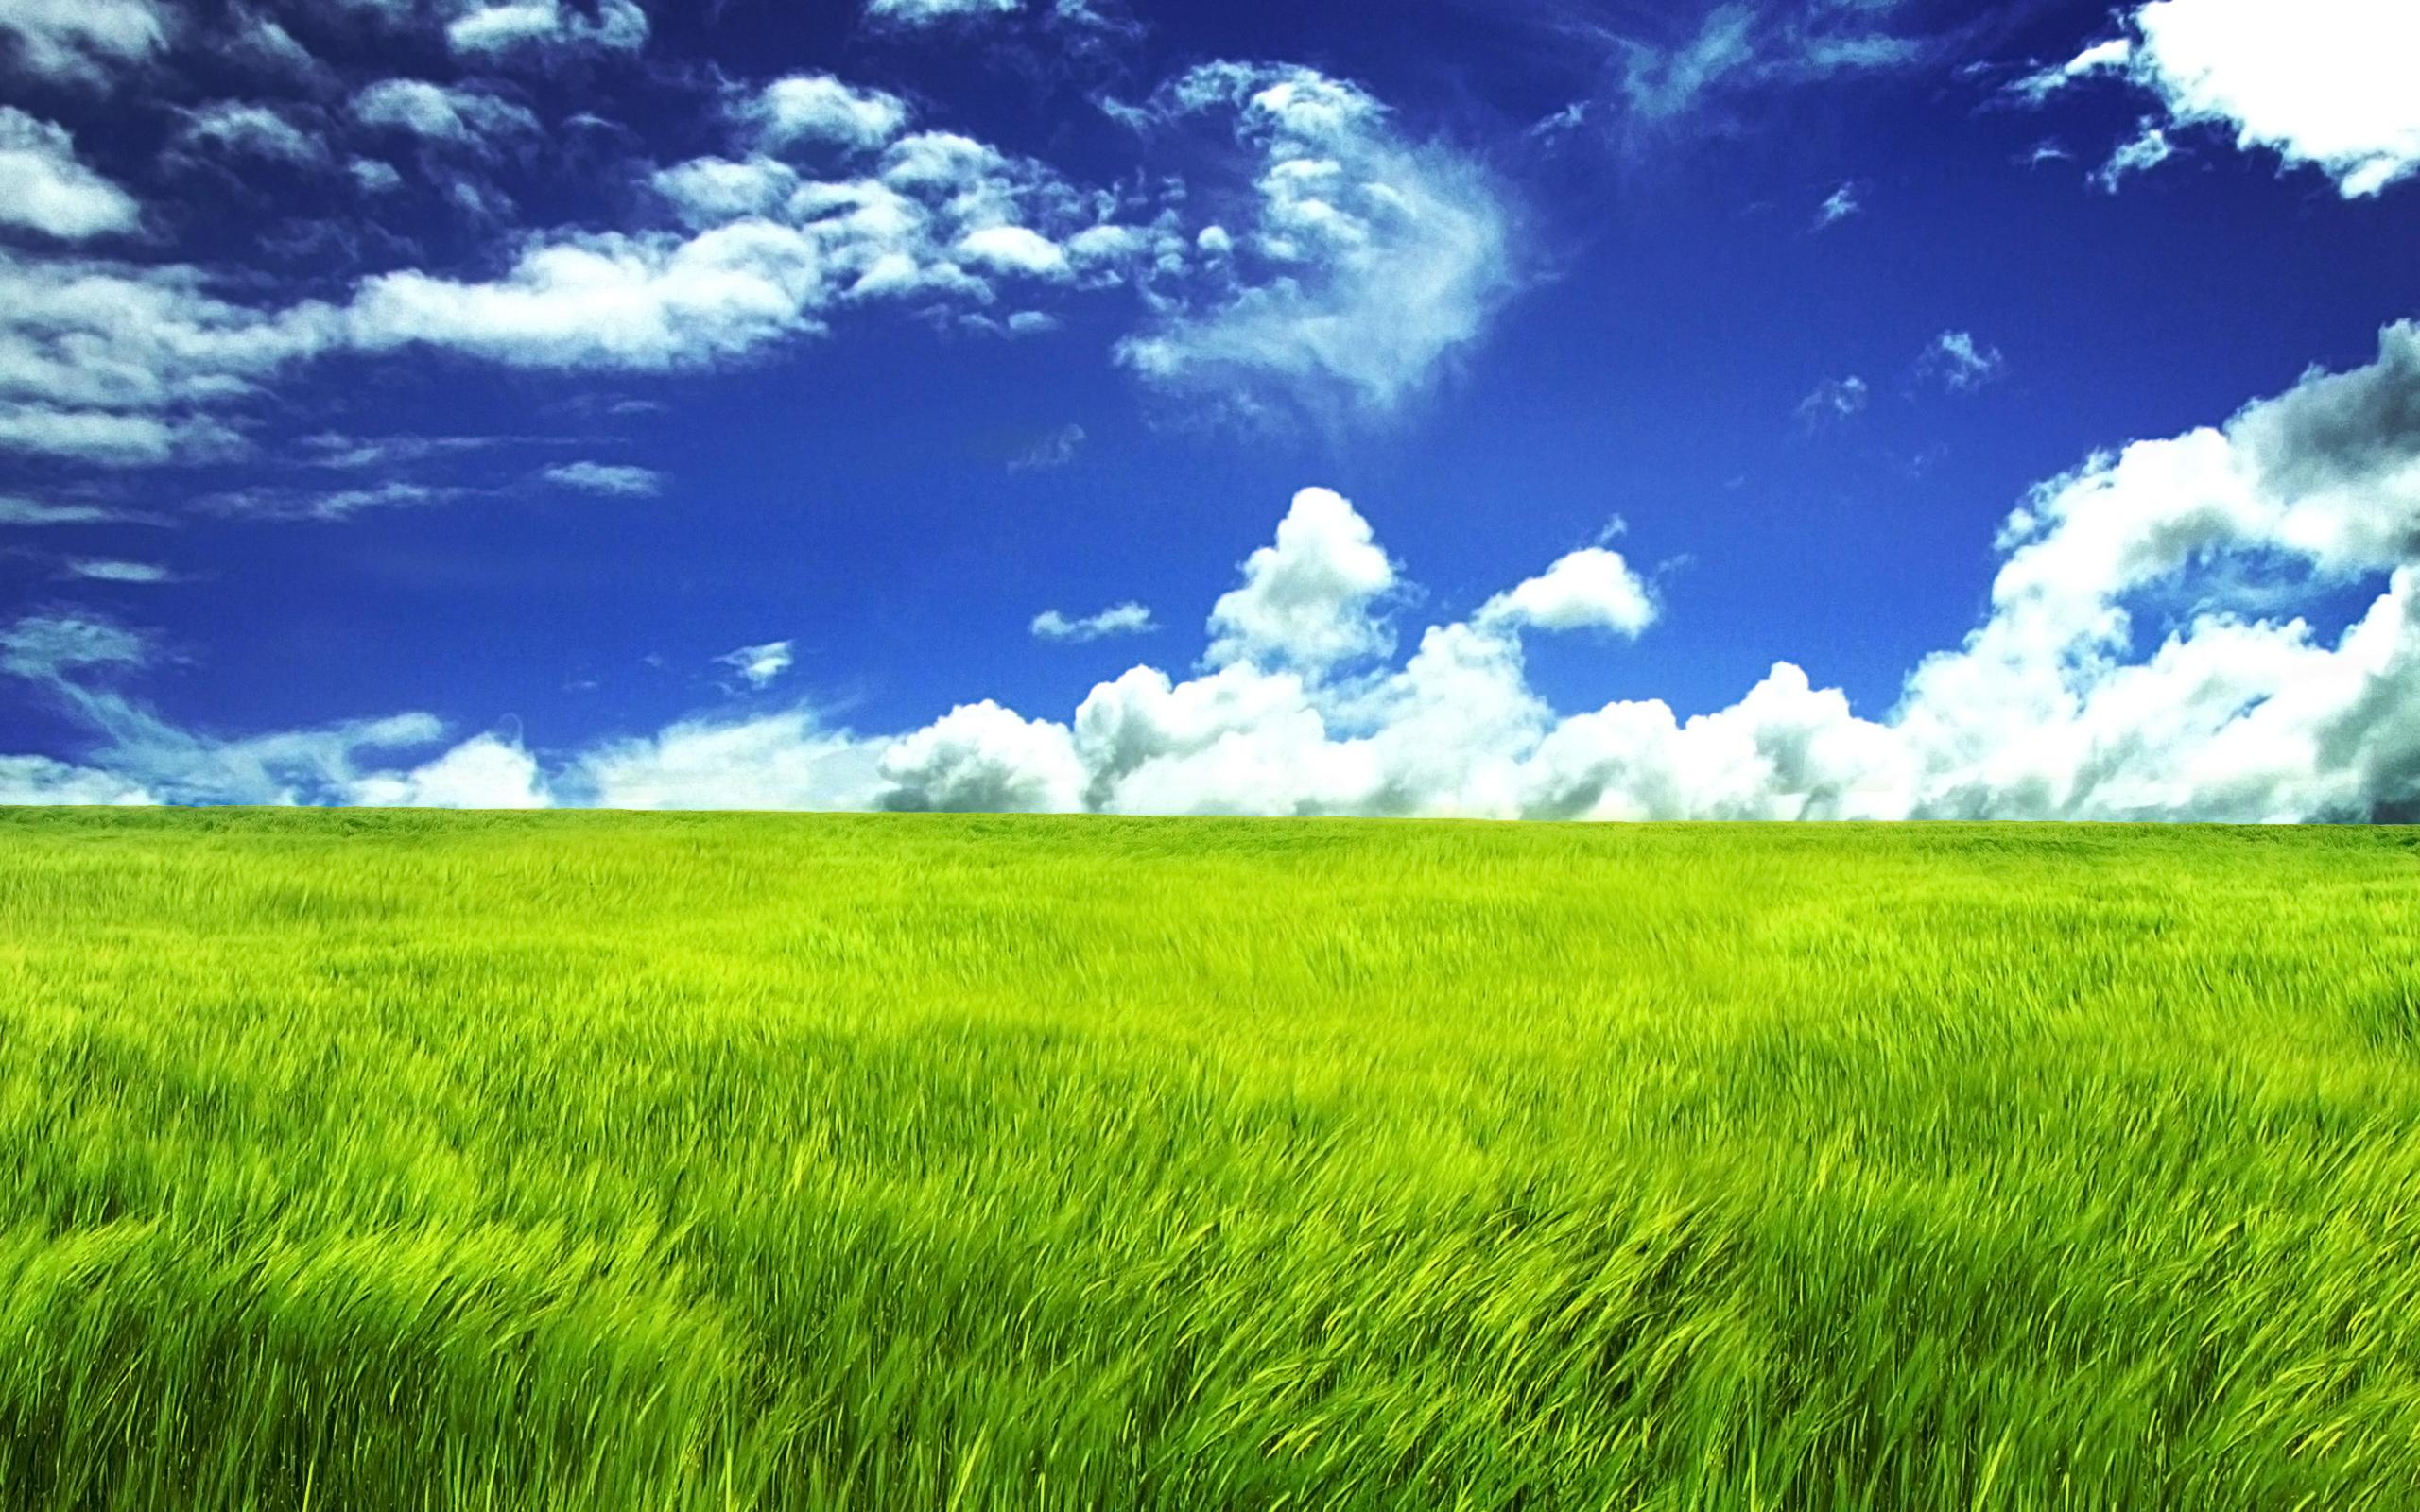 https://hdwallsource.com/img/2014/10/grass-backgro...